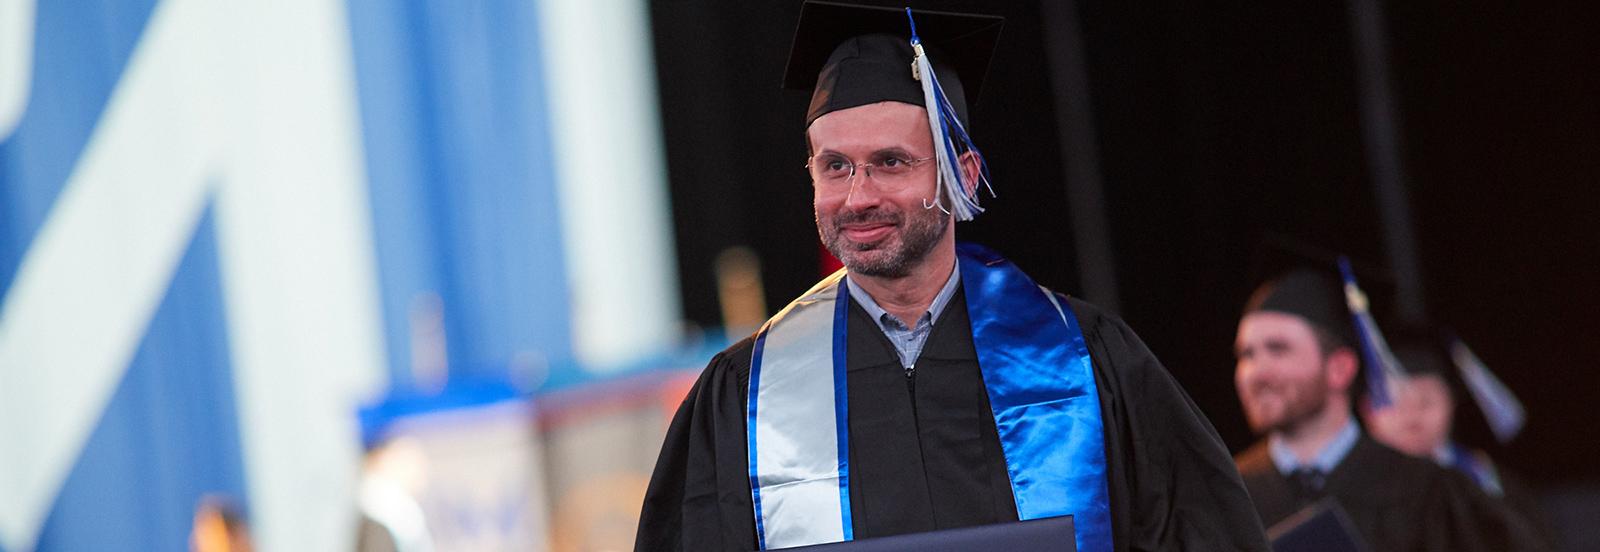 adult student at graduation